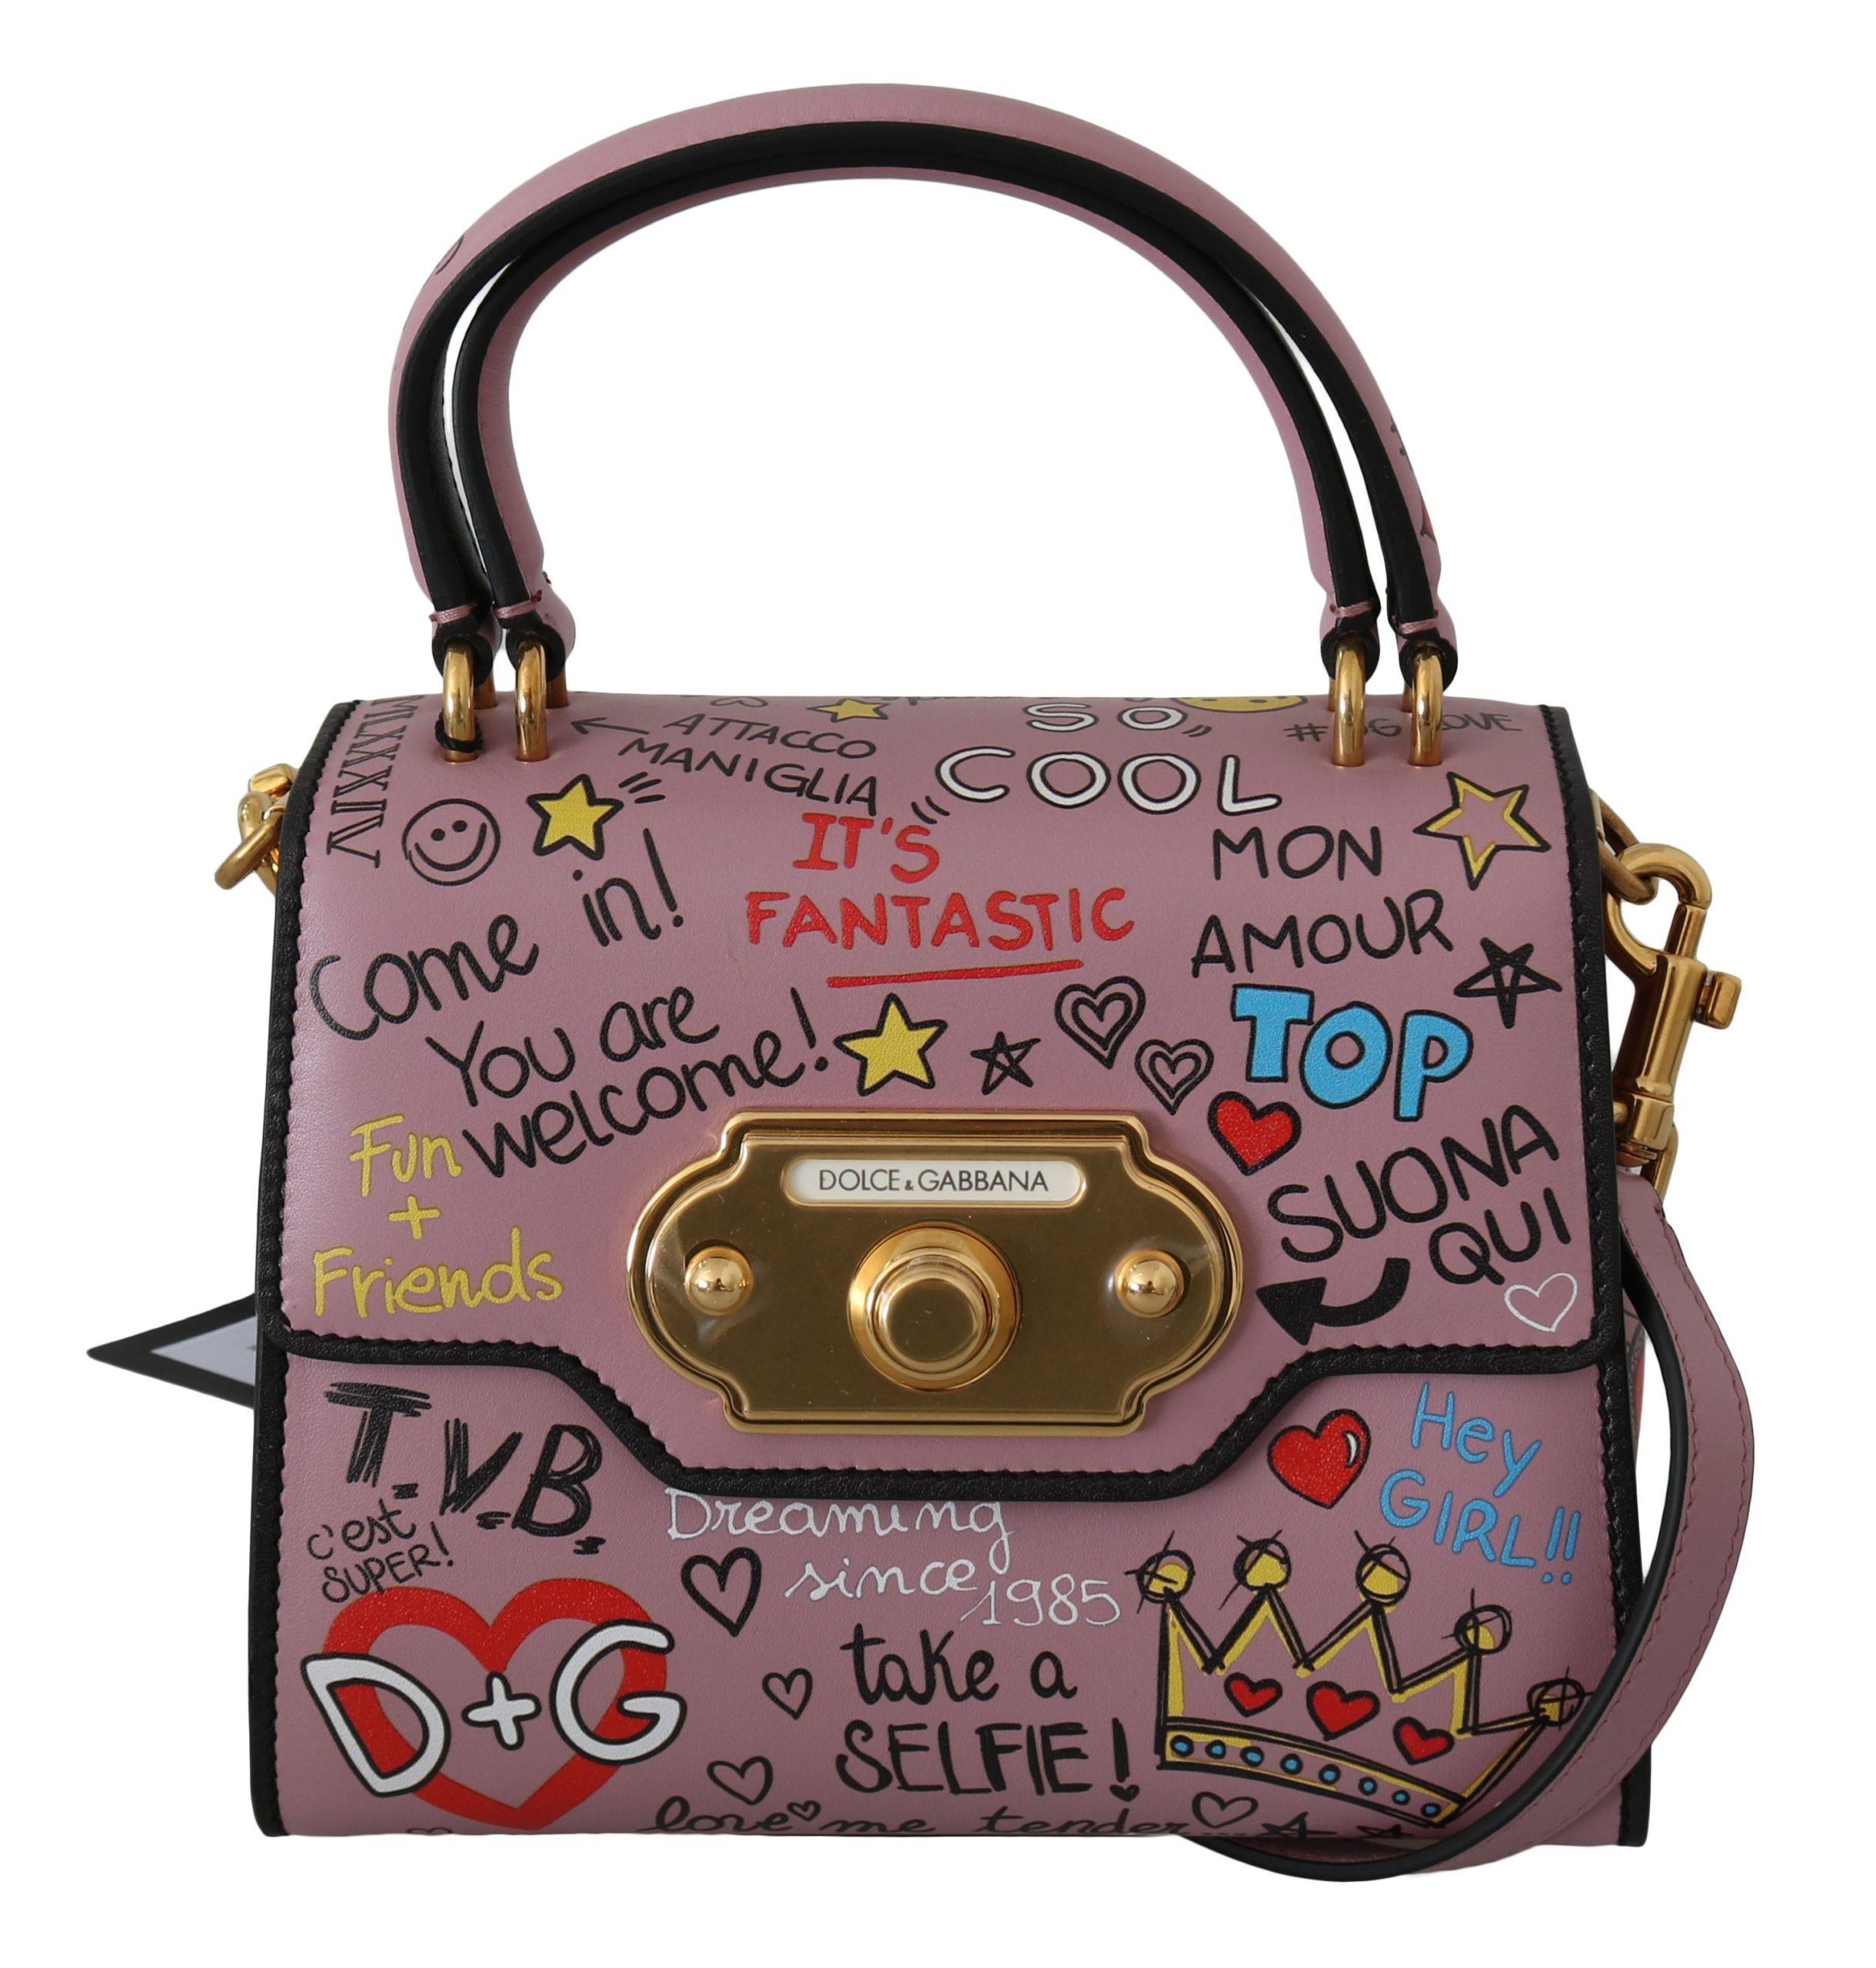 Dolce & Gabbana Women's Leather DG Crown Crossbody Bag Pink Pink VAS8745